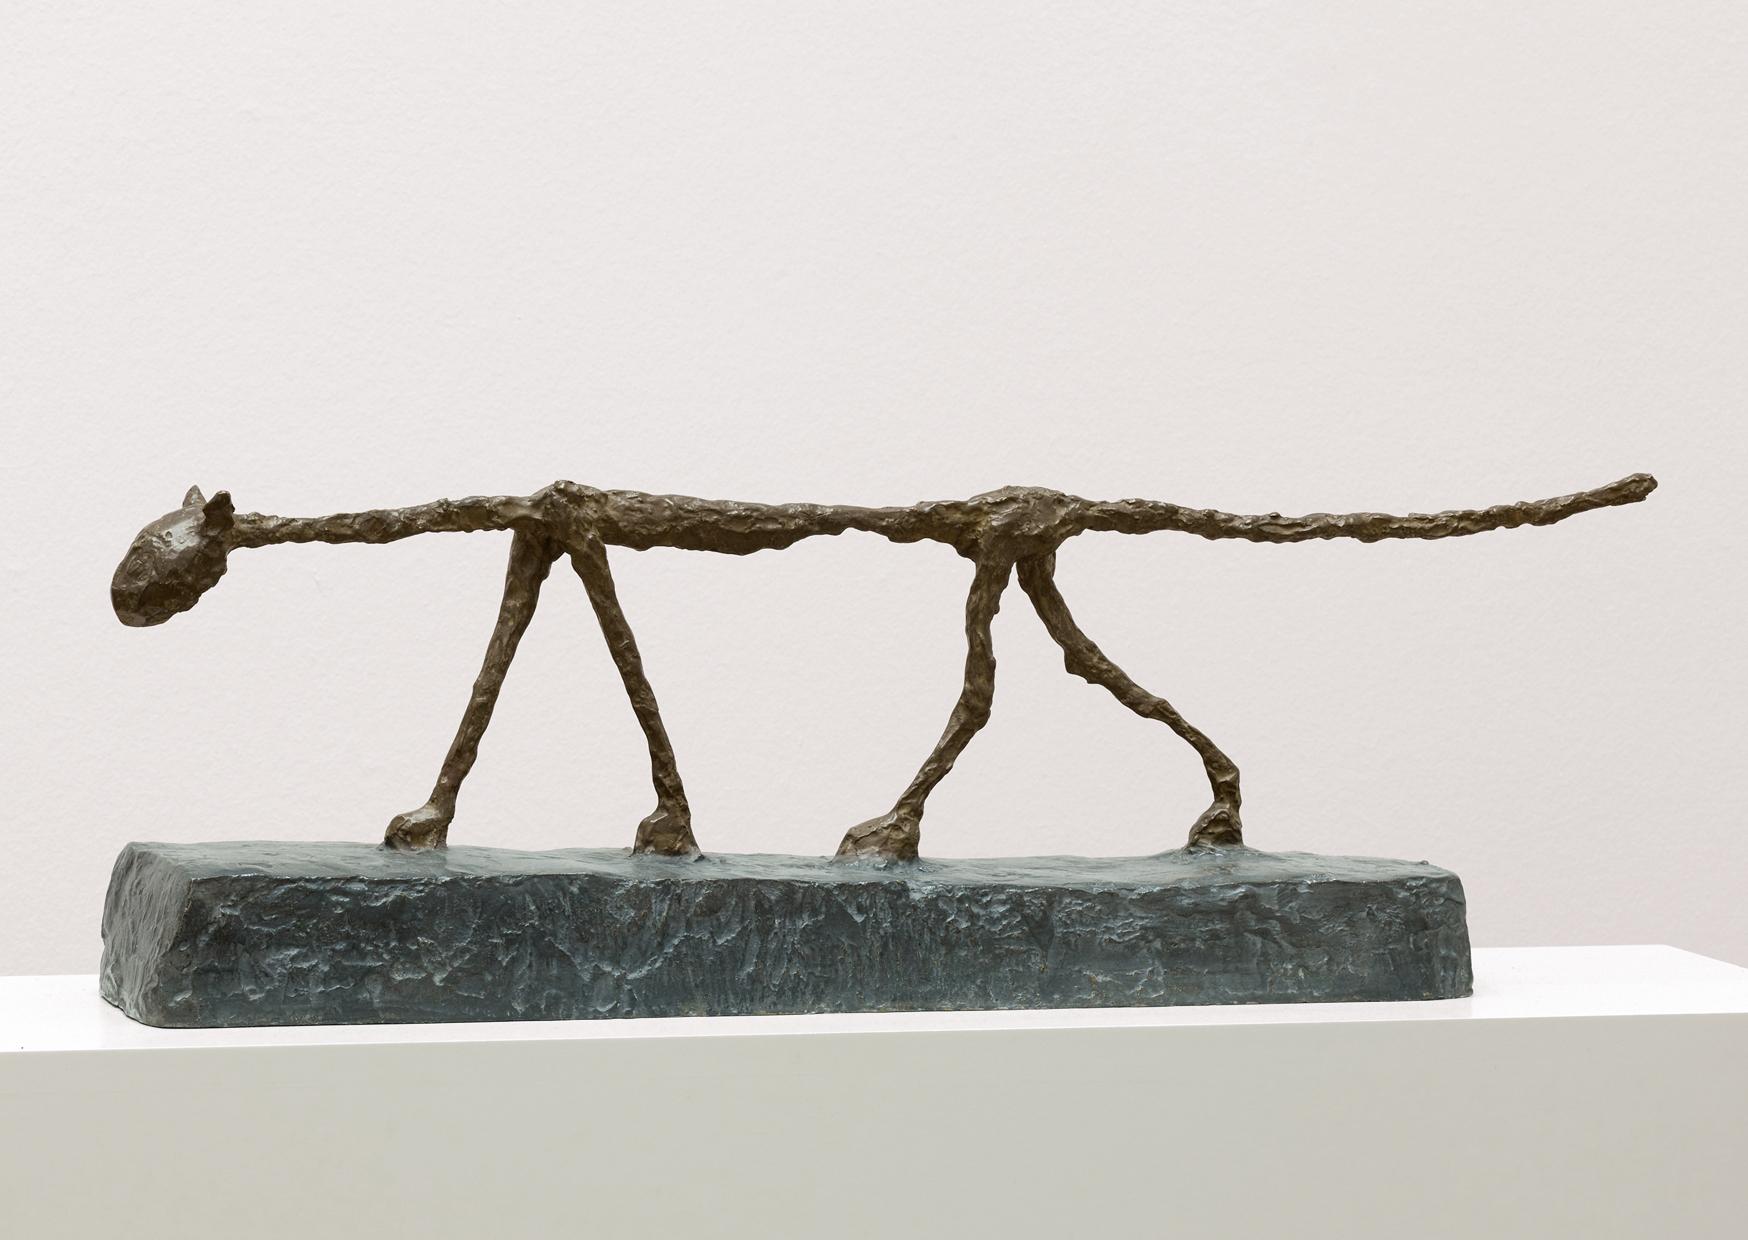 Alberto Giacometti, The Cat, 1951, Kunstmuseum Basel Depositum der Alberto Giacometti-Stiftung